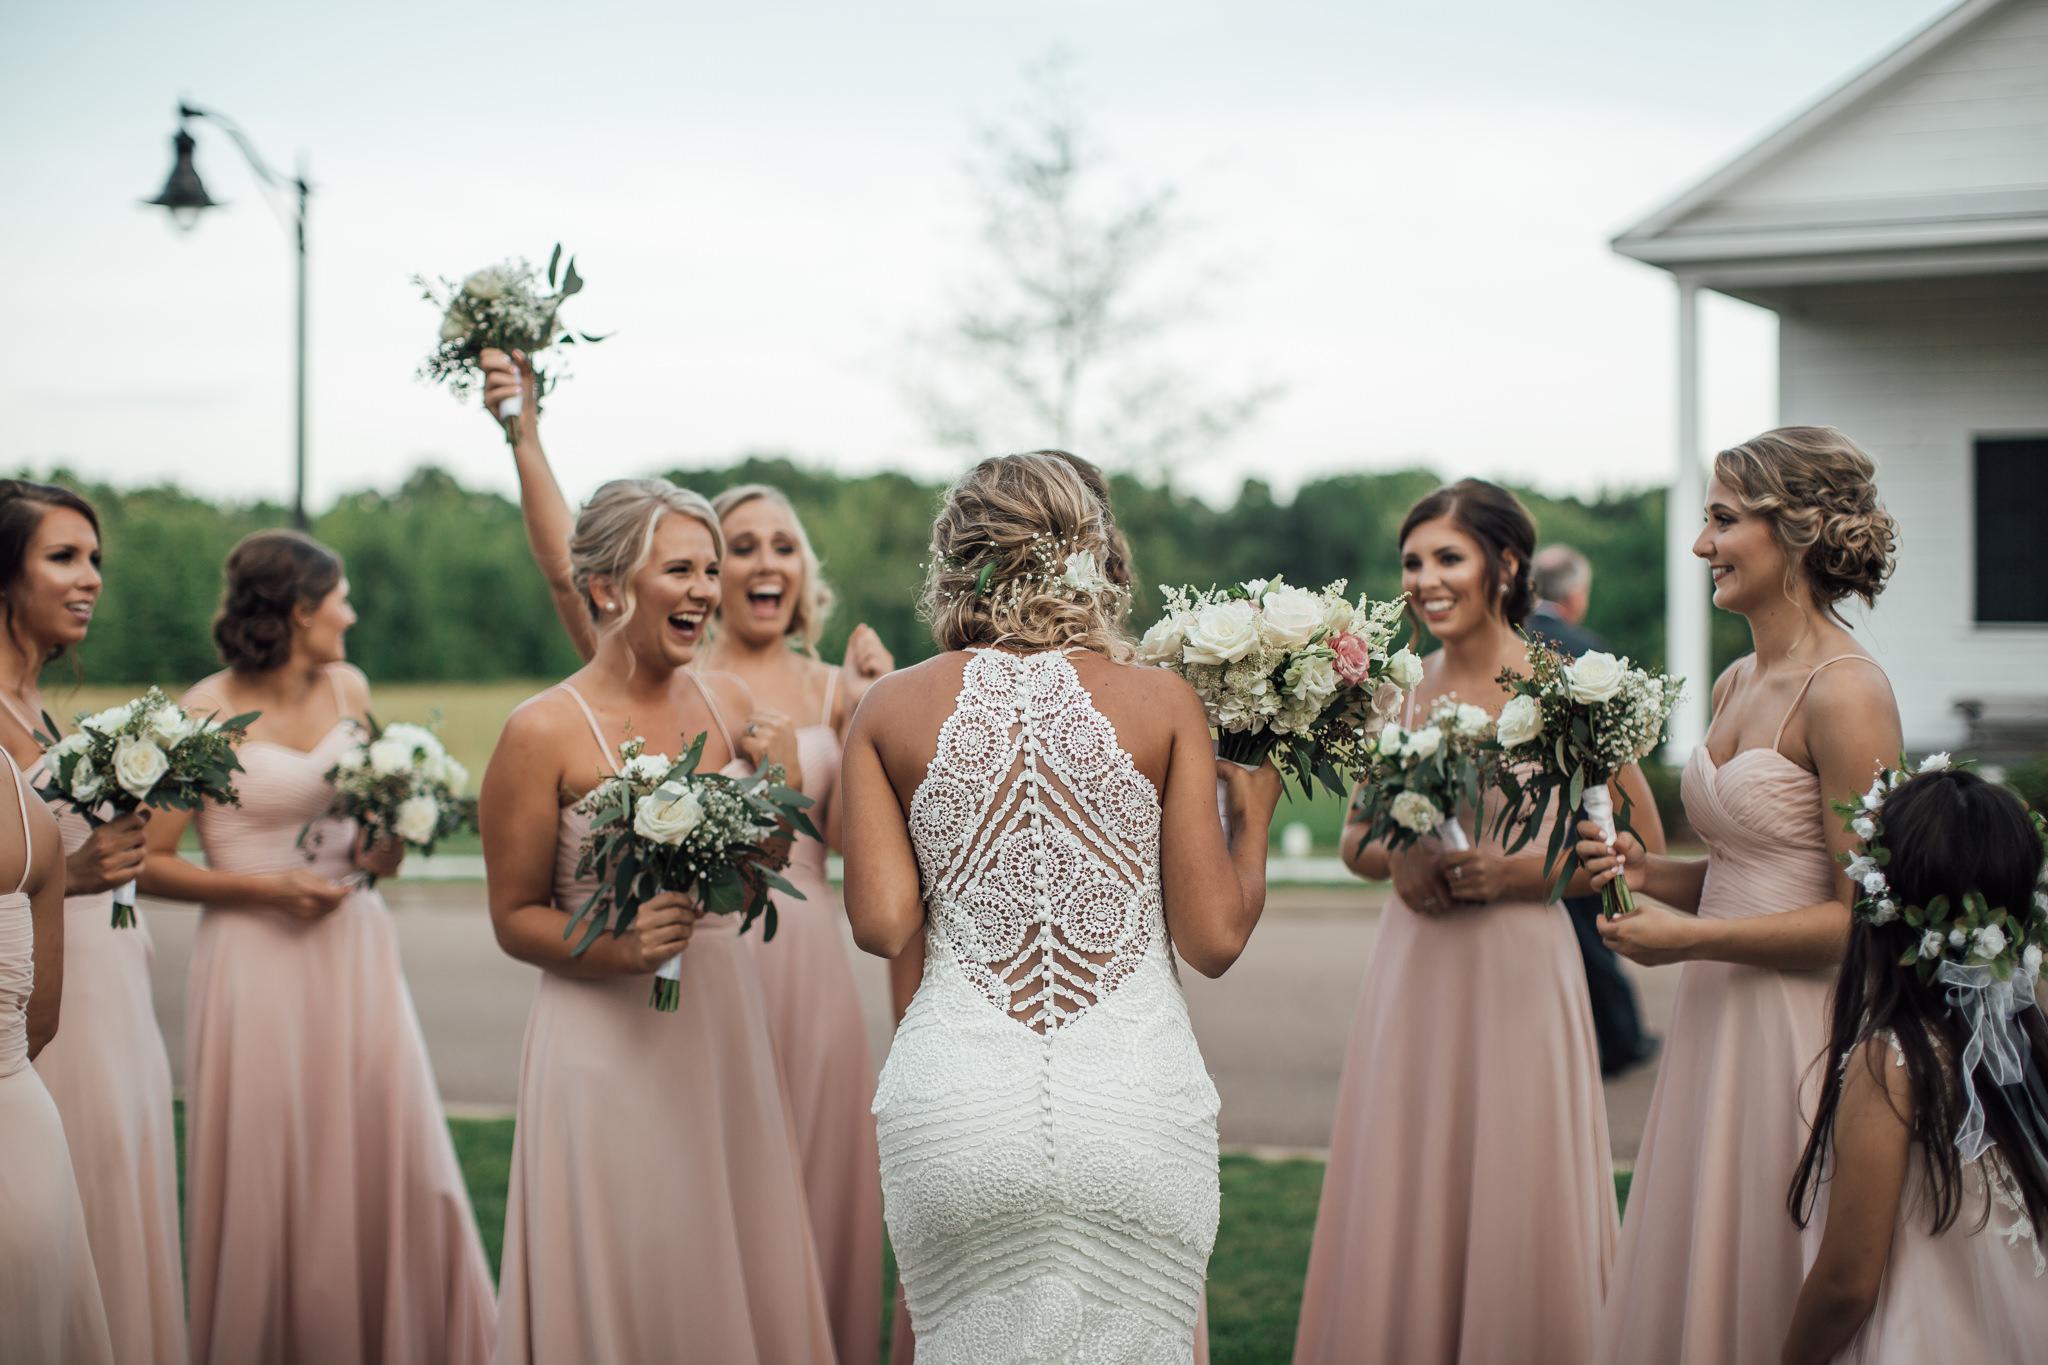 cassie-cook-photography-memphis-wedding-photographer-hedge-farm-wedding-venue-241.jpg